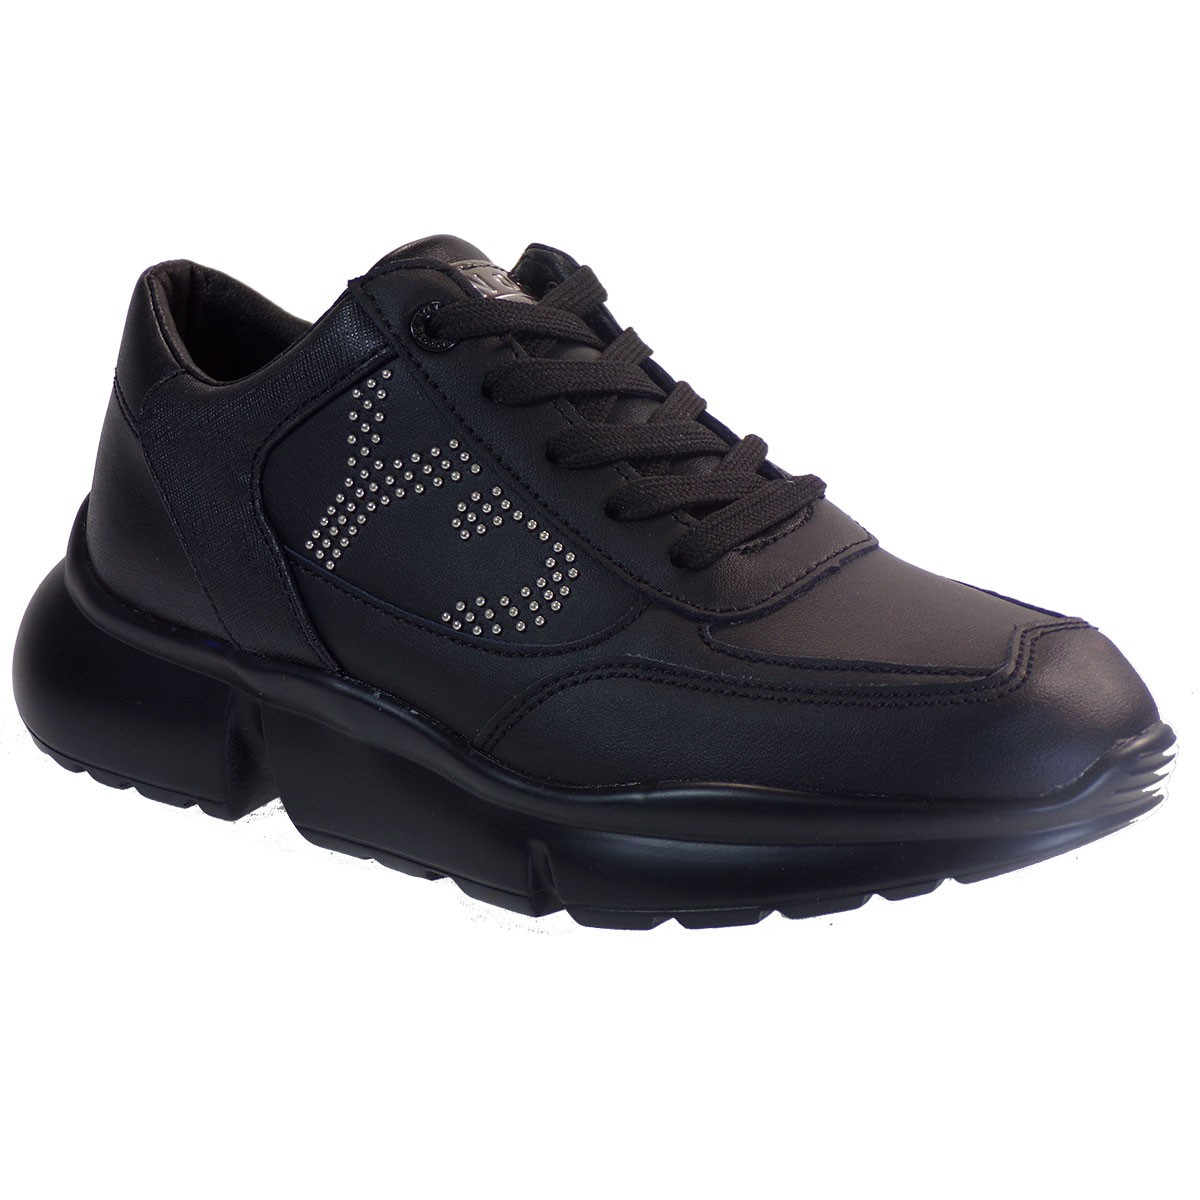 YNOT Sneakers Γυναικεία Παπούτσια YNIO210 Μαύρο